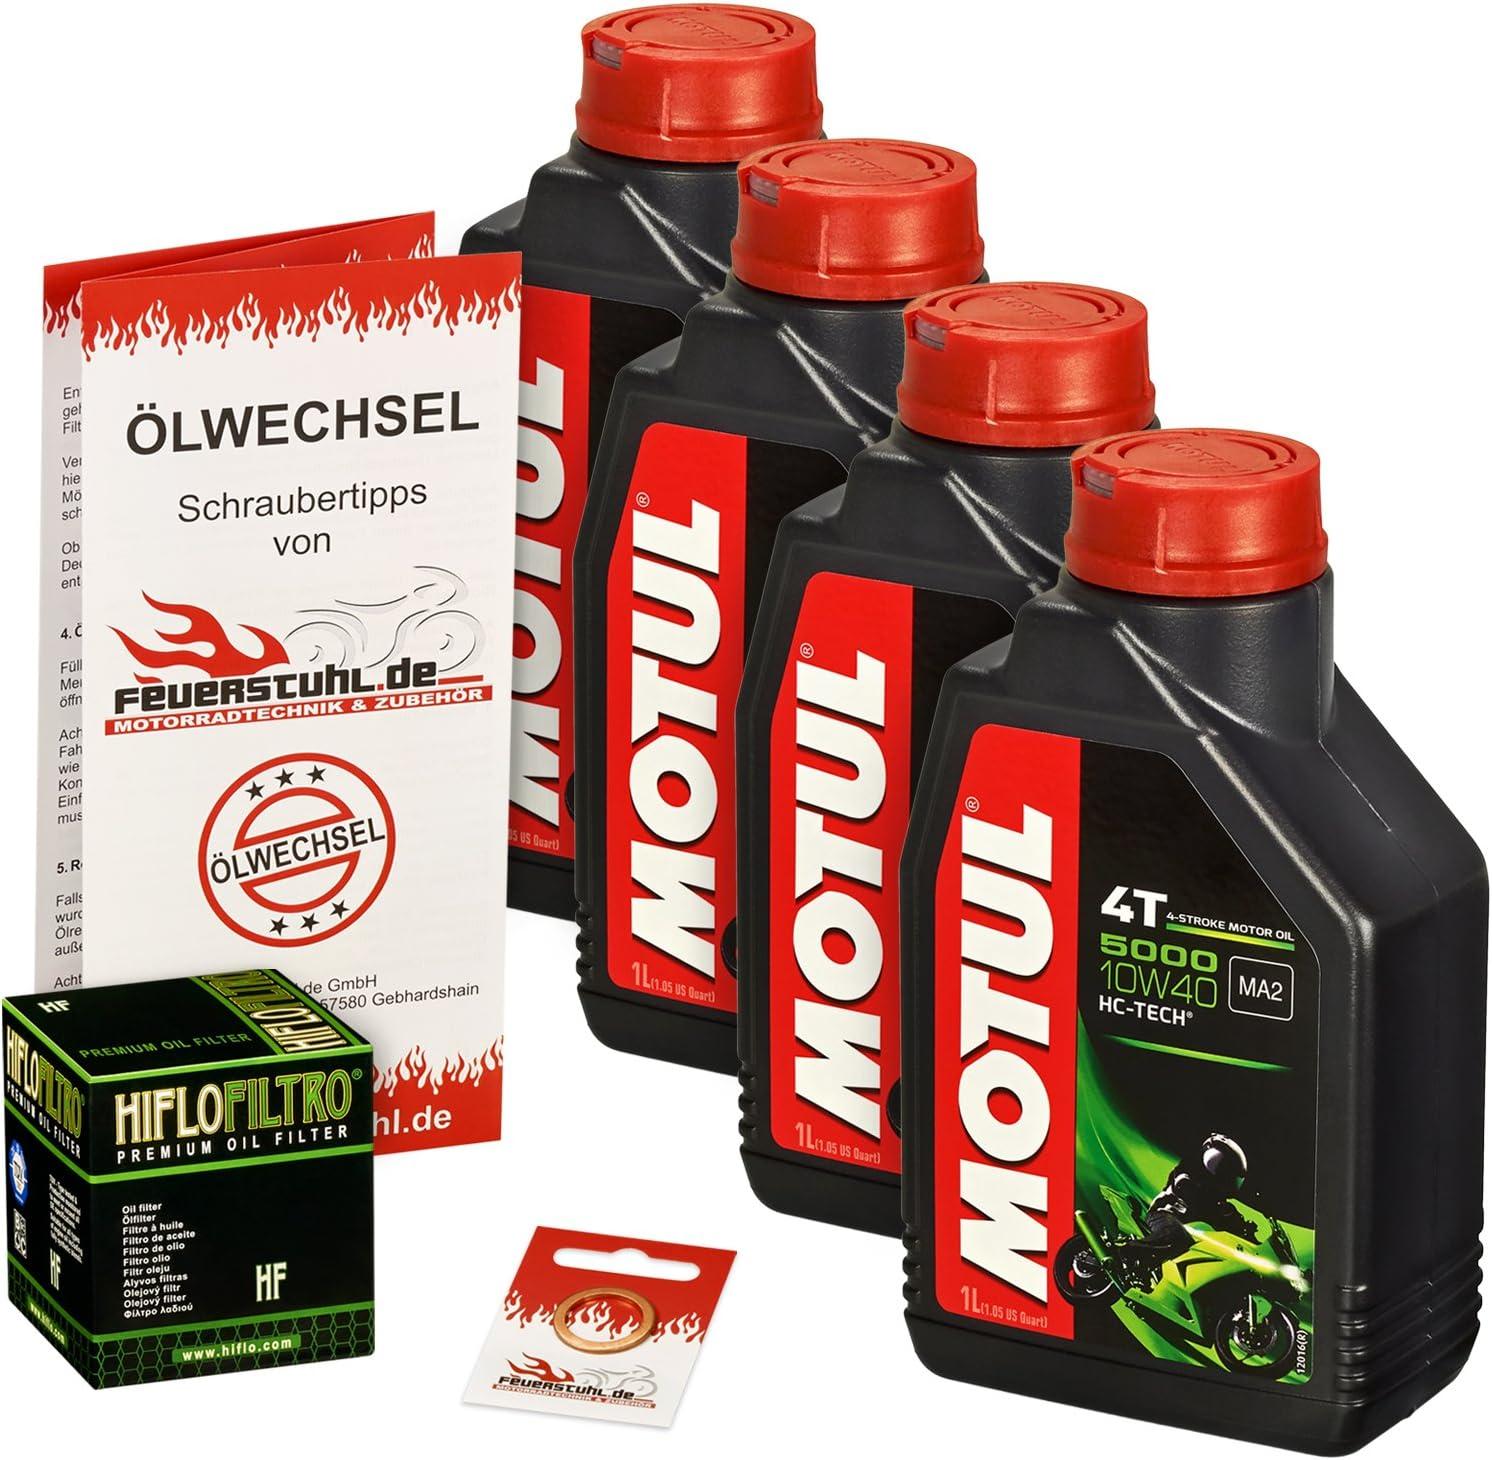 Motul 10w 40 Öl Hiflo Ölfilter Für Yamaha Xv 1100 Virago 89 99 3lp Ölwechselset Inkl Motoröl Filter Dichtring Auto